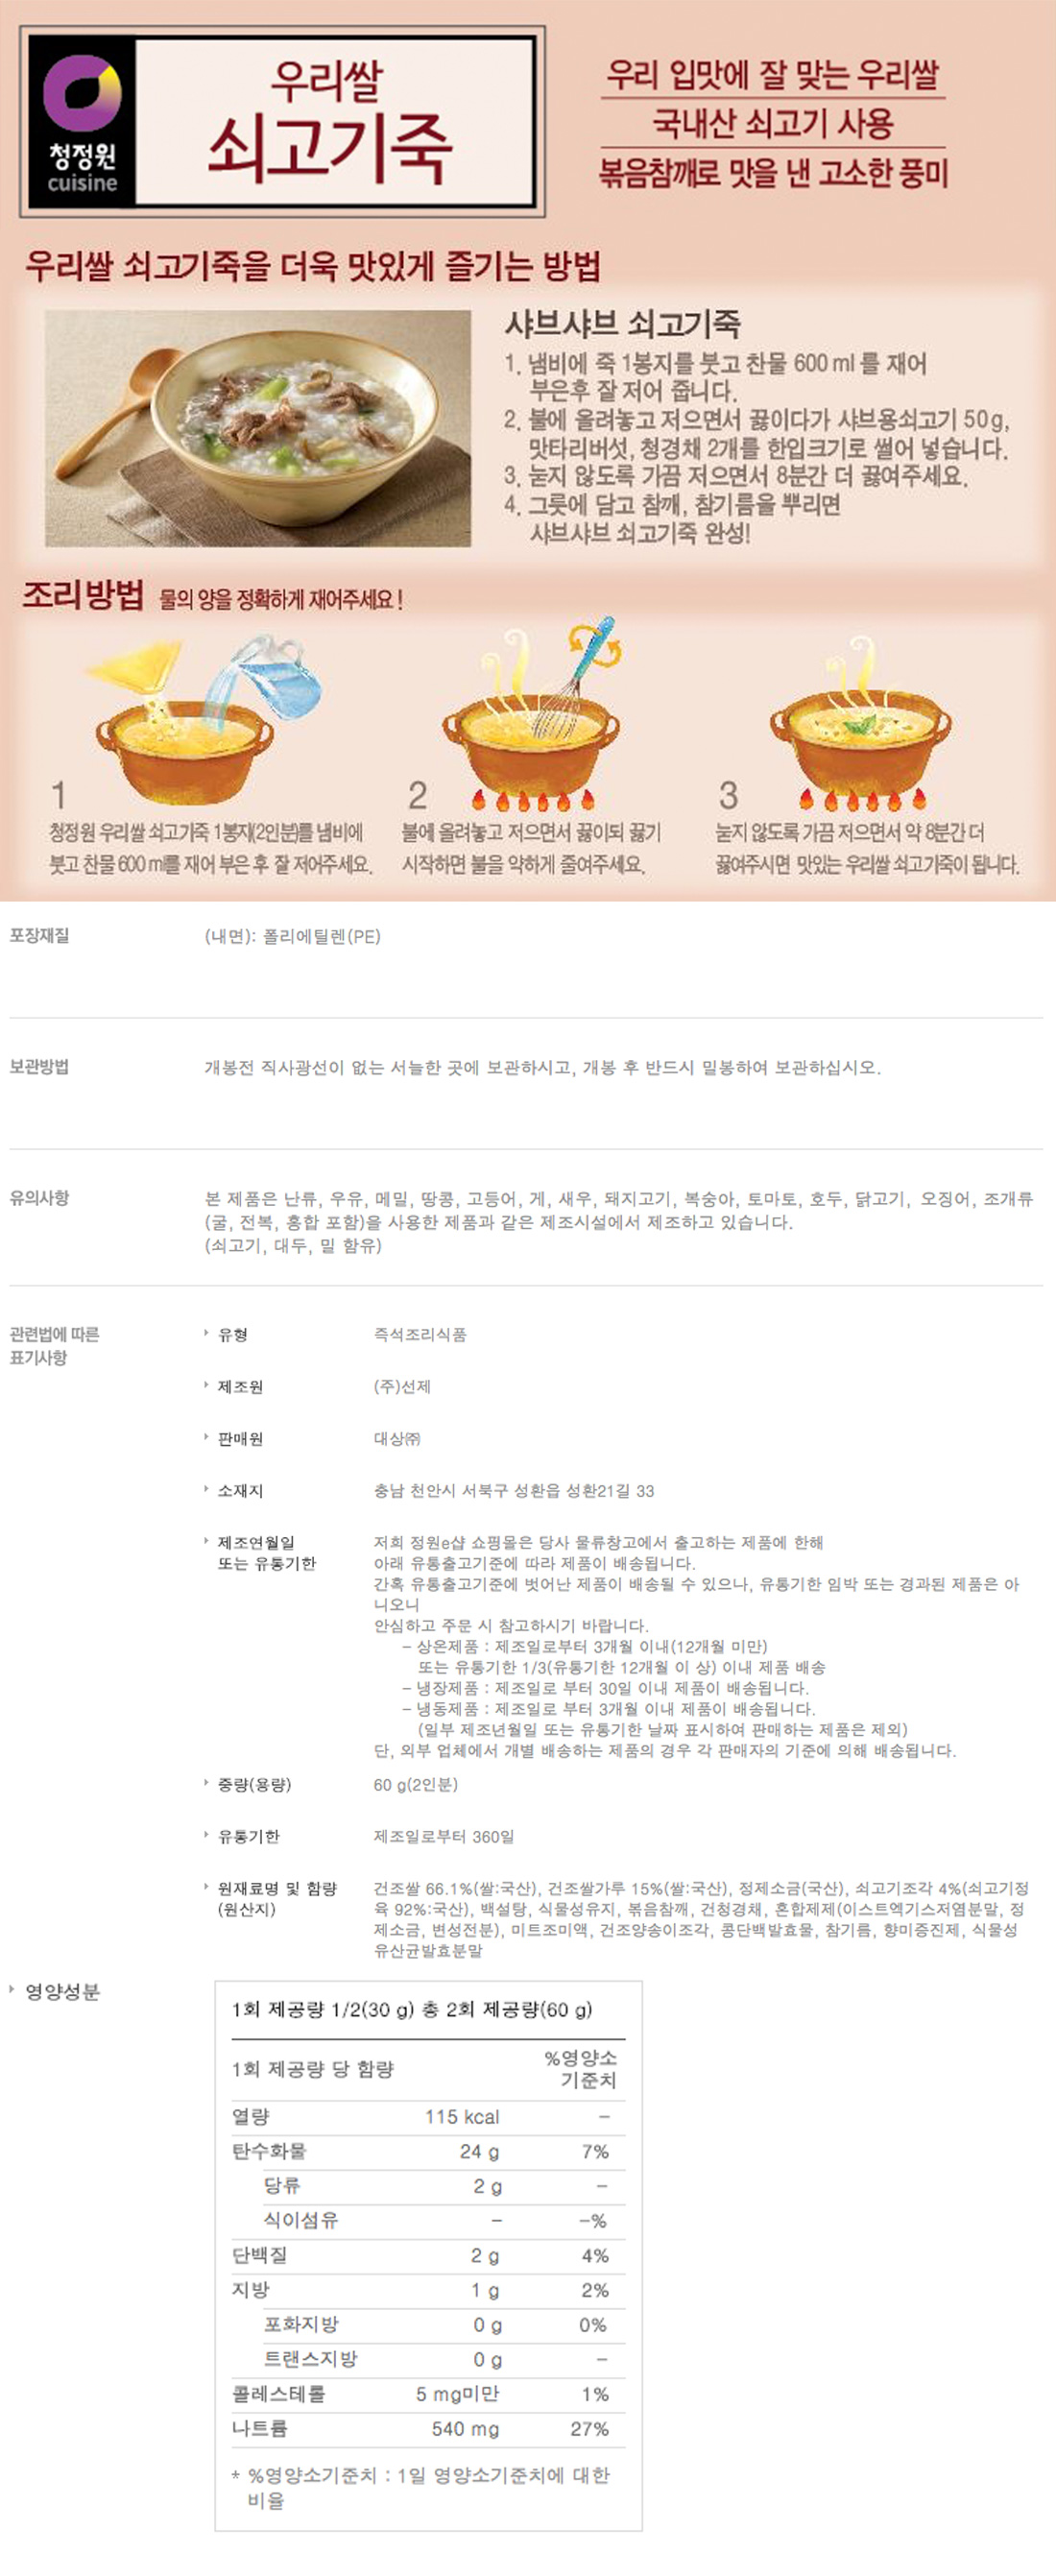 [ chungjungone ] 清净园,韩国大米 牛肉粥 60g*10ea